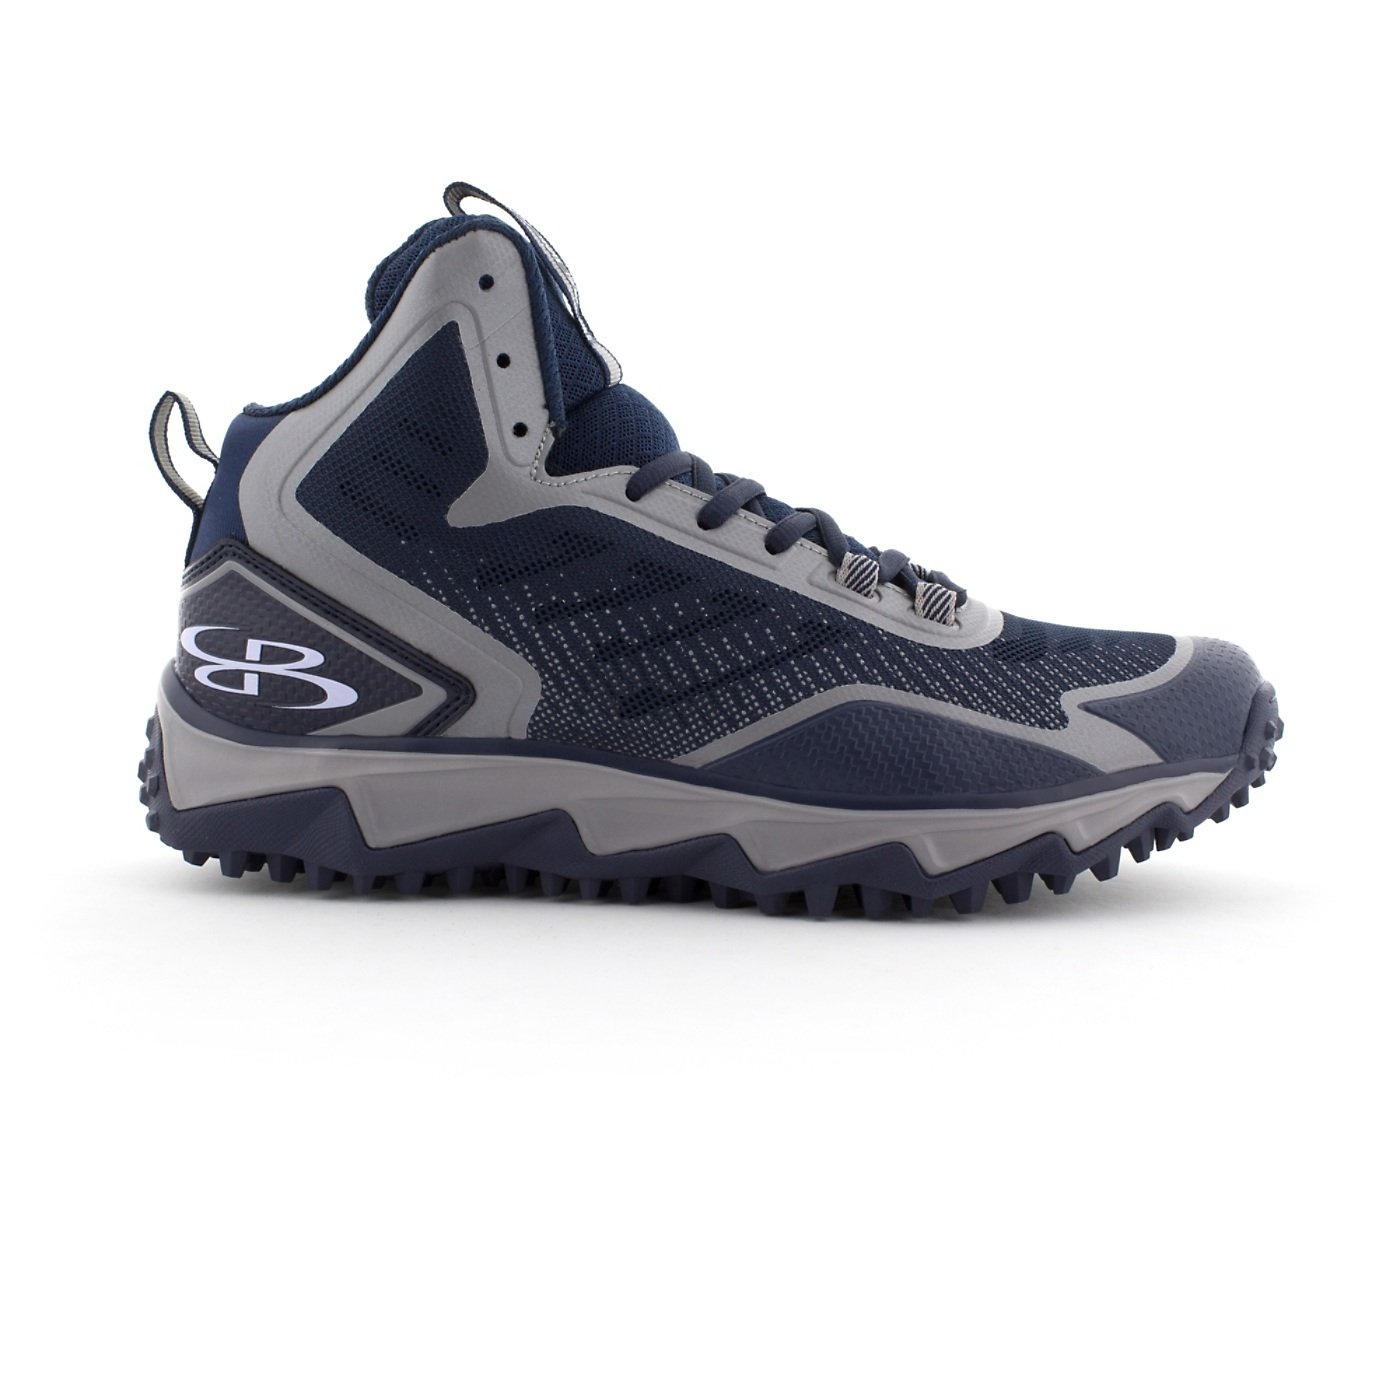 BoombahメンズBerzerk Mid Turf Shoes – 8カラーオプション – 複数のサイズ B0769WM8KR 10.5|ネイビー/グレー ネイビー/グレー 10.5